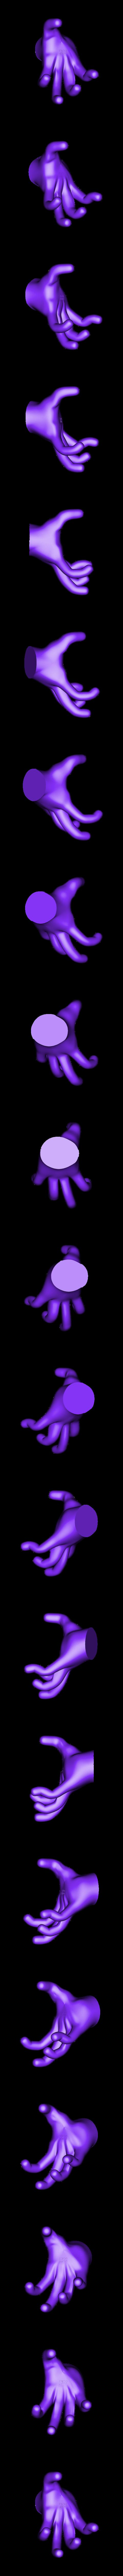 Mano_1_Palma_dukedoks.stl Télécharger fichier STL gratuit Cartoon Hand Adams • Design à imprimer en 3D, dukedoks